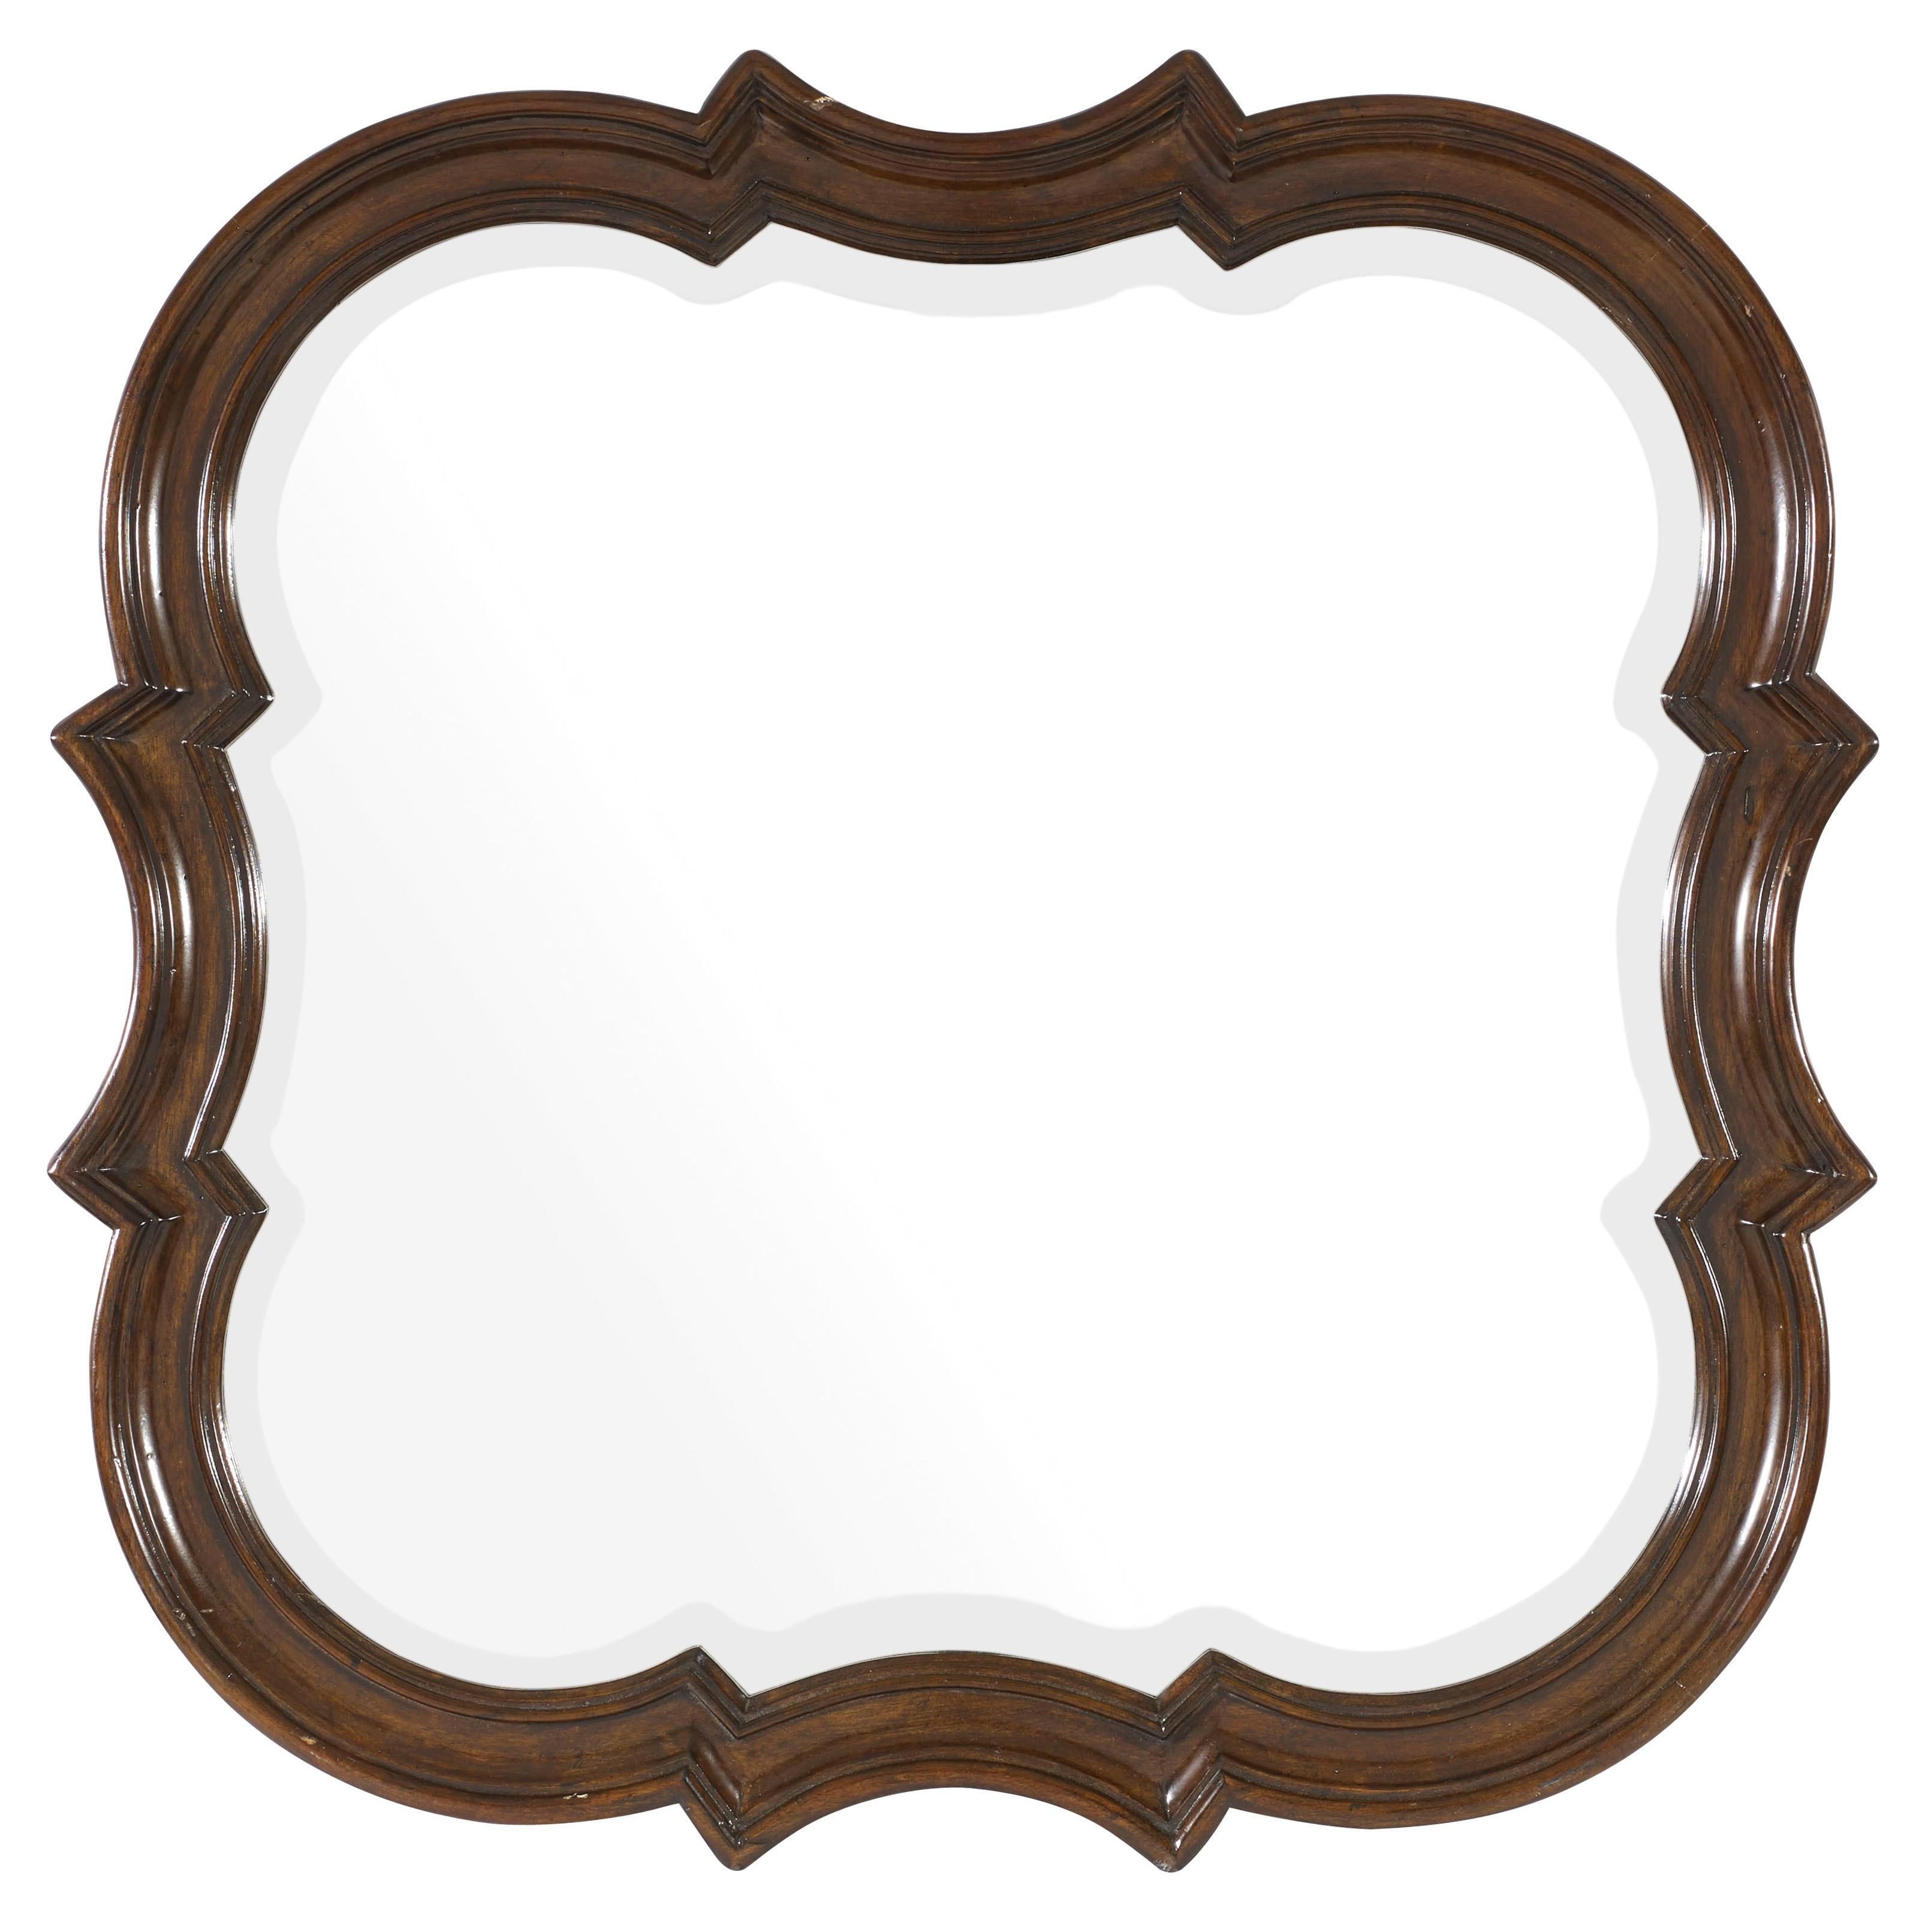 Hooker Furniture Leesburg Accent Mirror - Item Number: 5381-90009